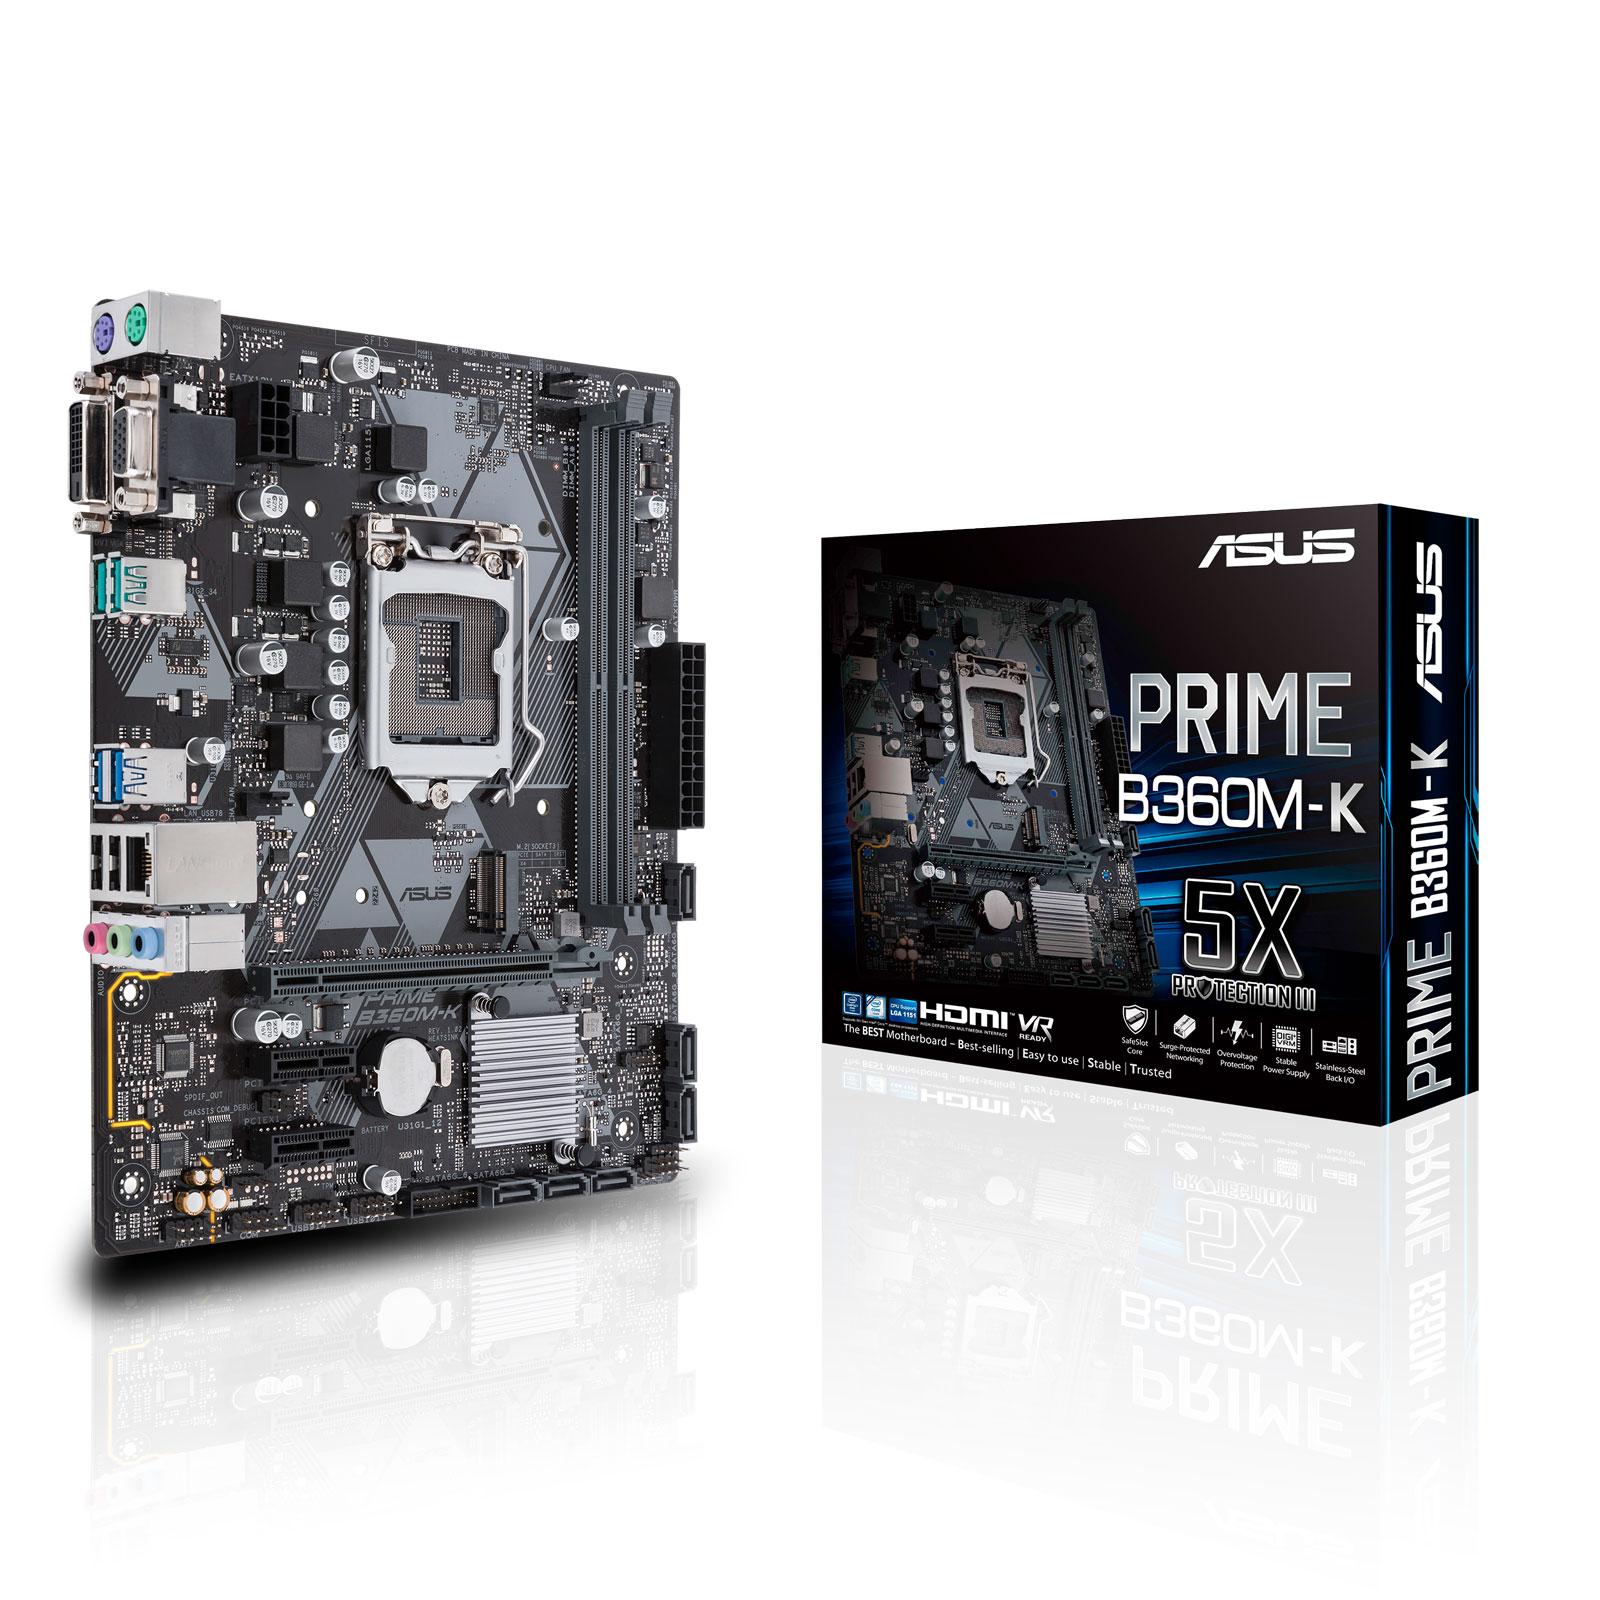 Carte mère ASUS PRIME B360M-K Carte mère Micro ATX Socket 1151 Intel B360 Express - 2x DDR4 - SATA 6Gb/s + M.2 - USB 3.1 - 1x PCI-Express 3.0 16x